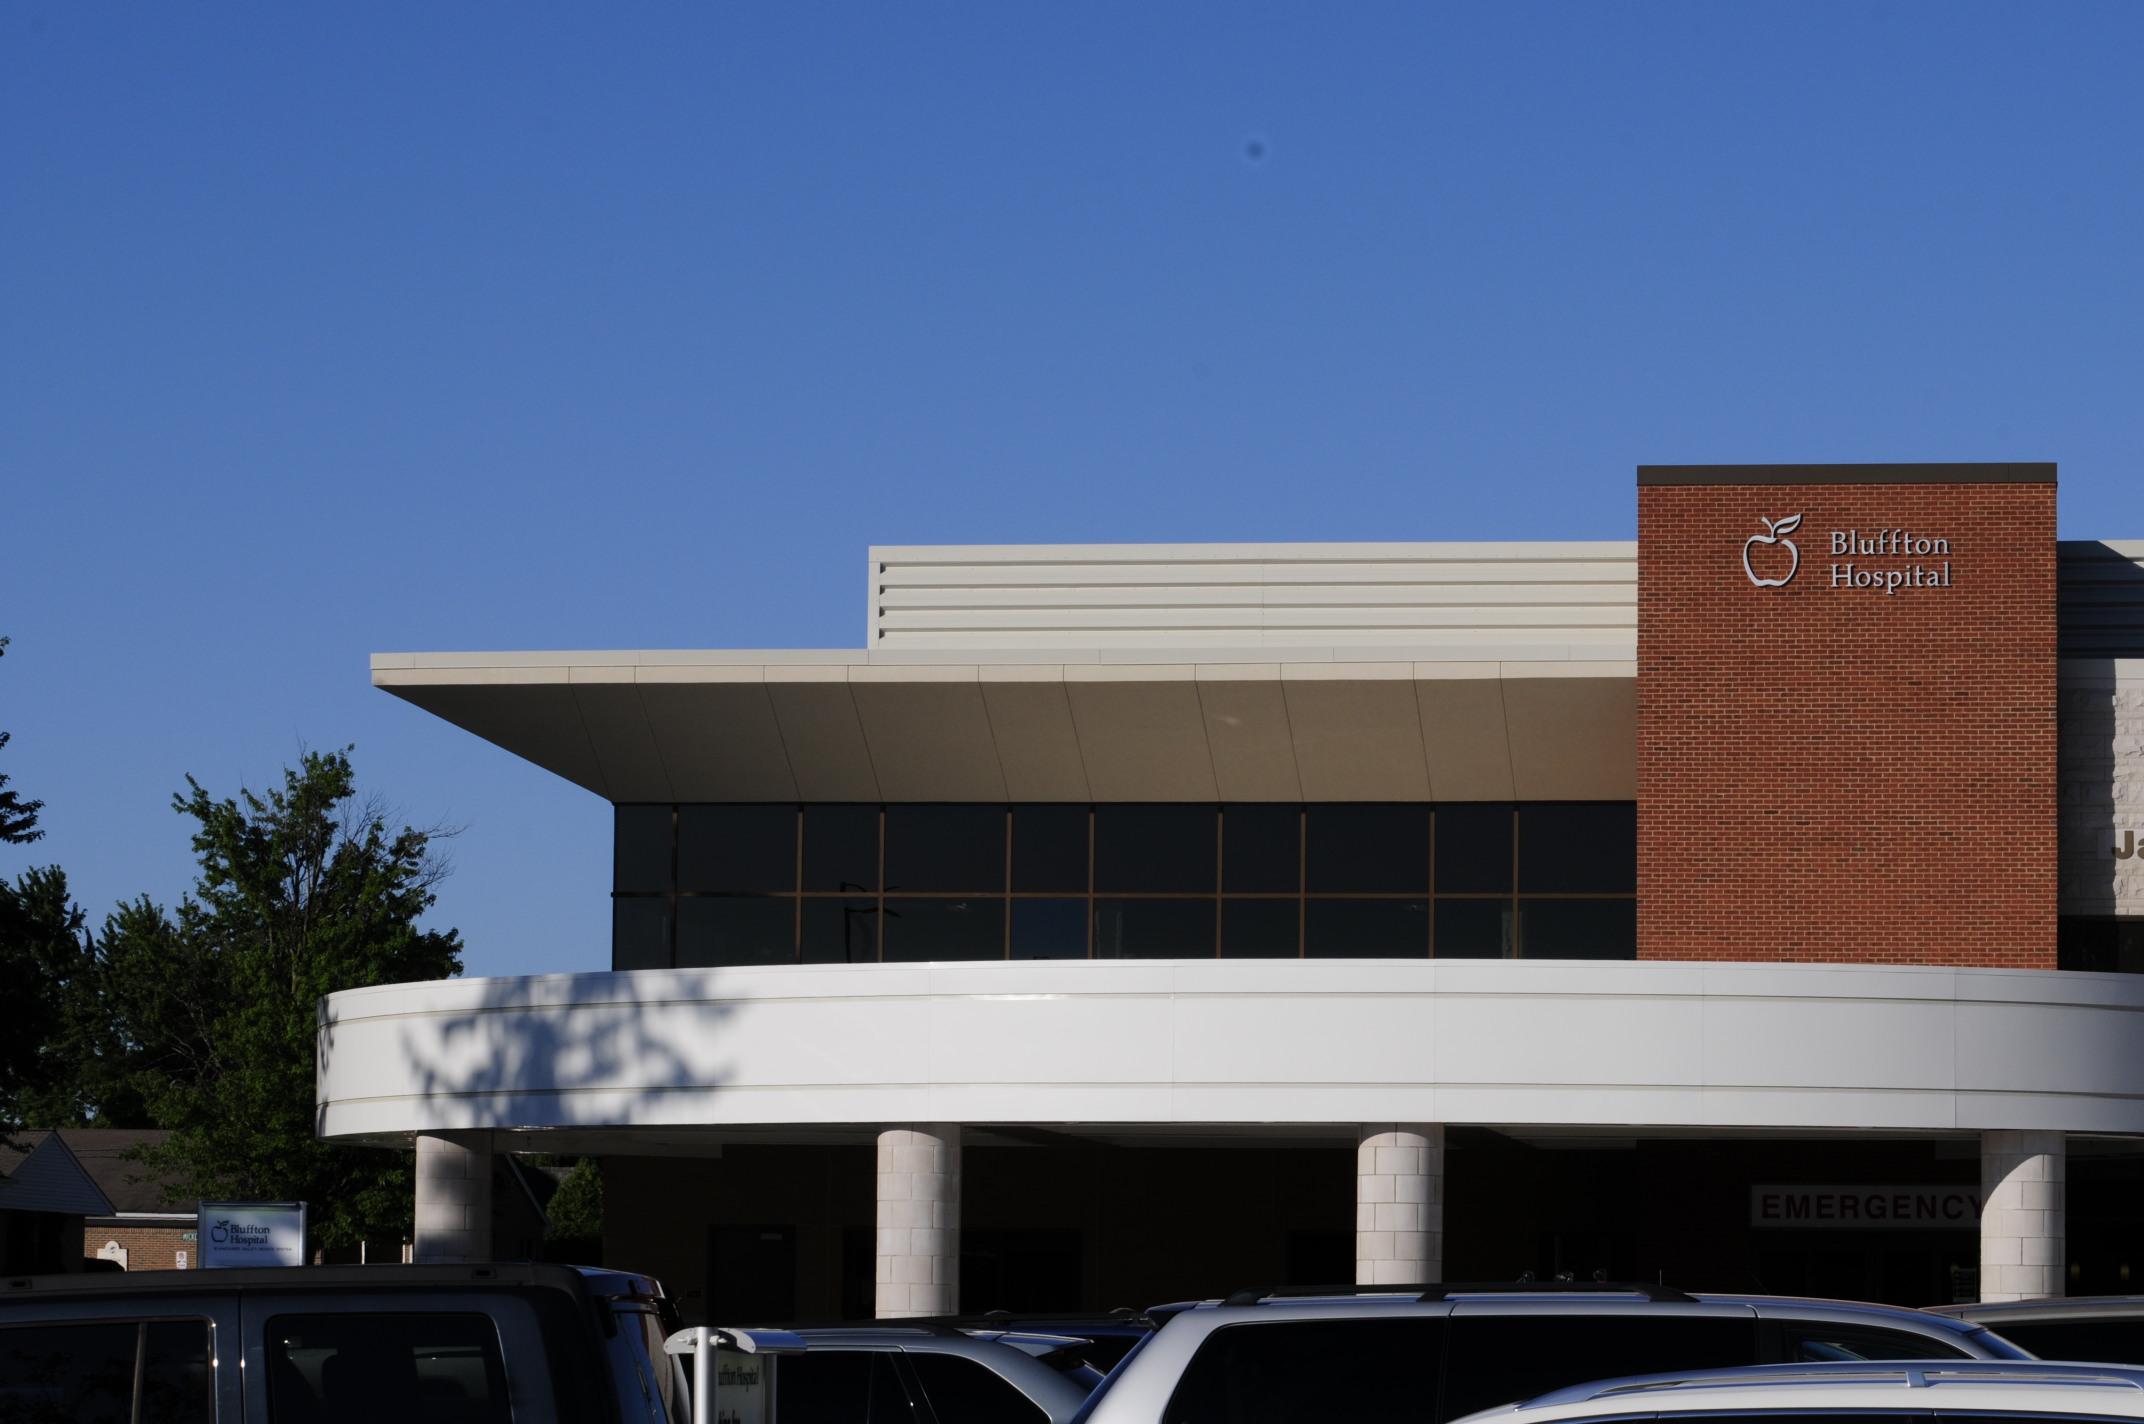 www.rcmarchitects.com - bvhs - bluffton hospital (3)